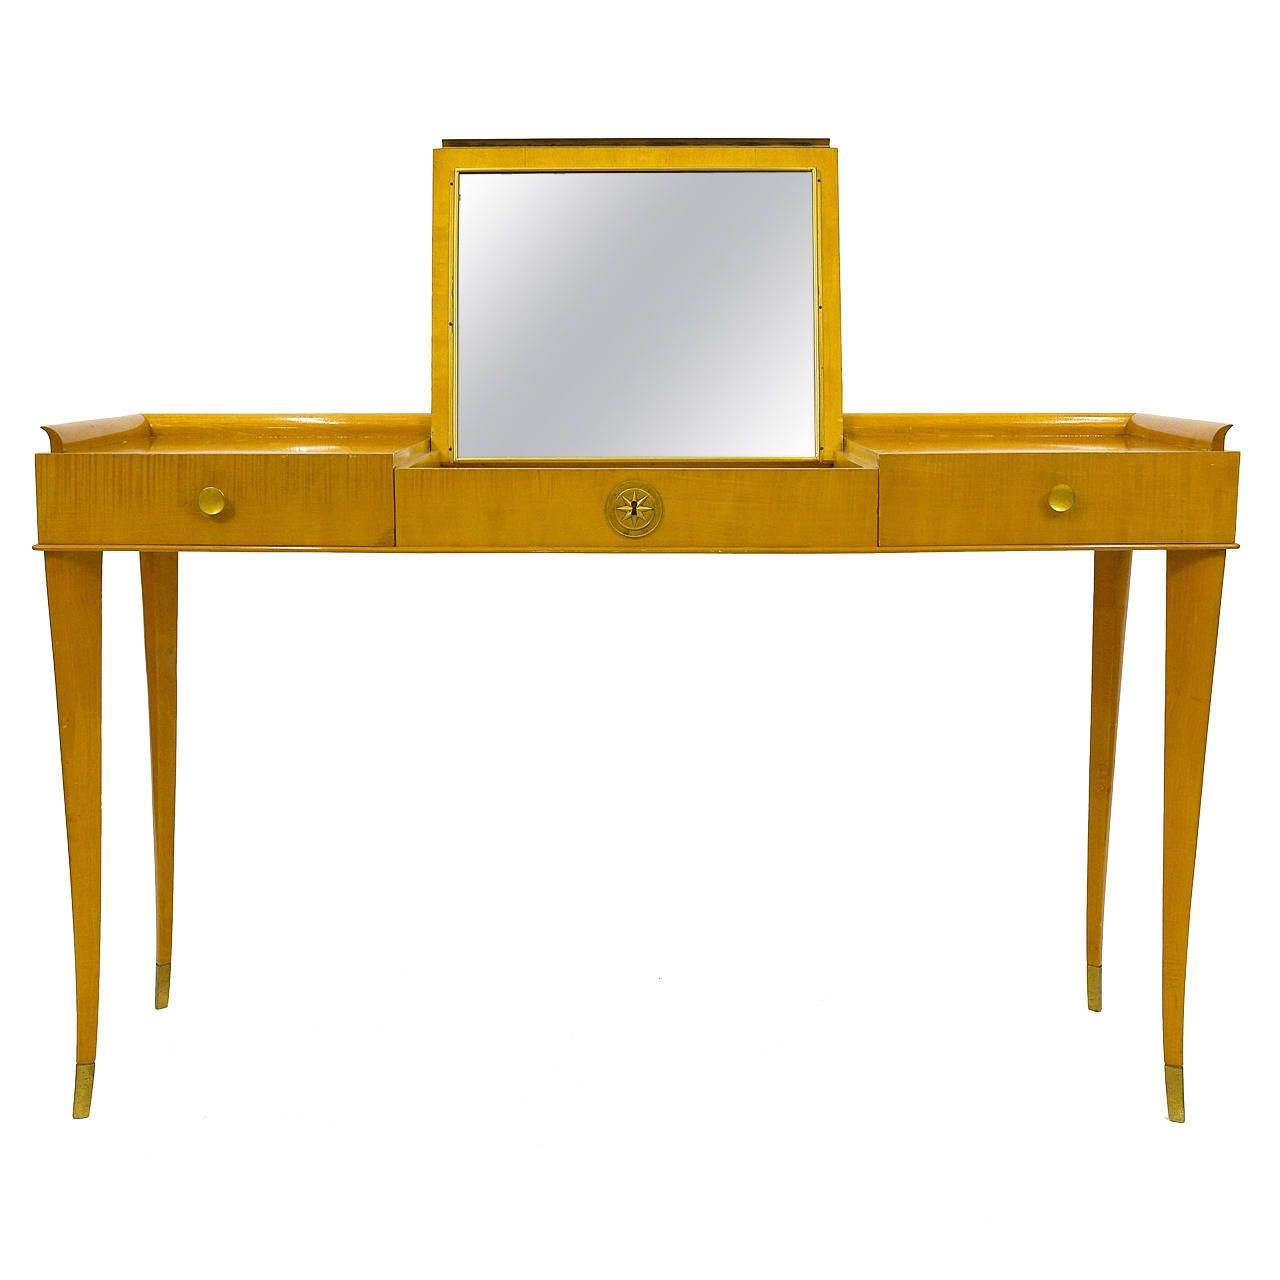 Italian attr gio ponti dressing table vanity console table gio ponti dressing table vanity console table writing desk geotapseo Choice Image